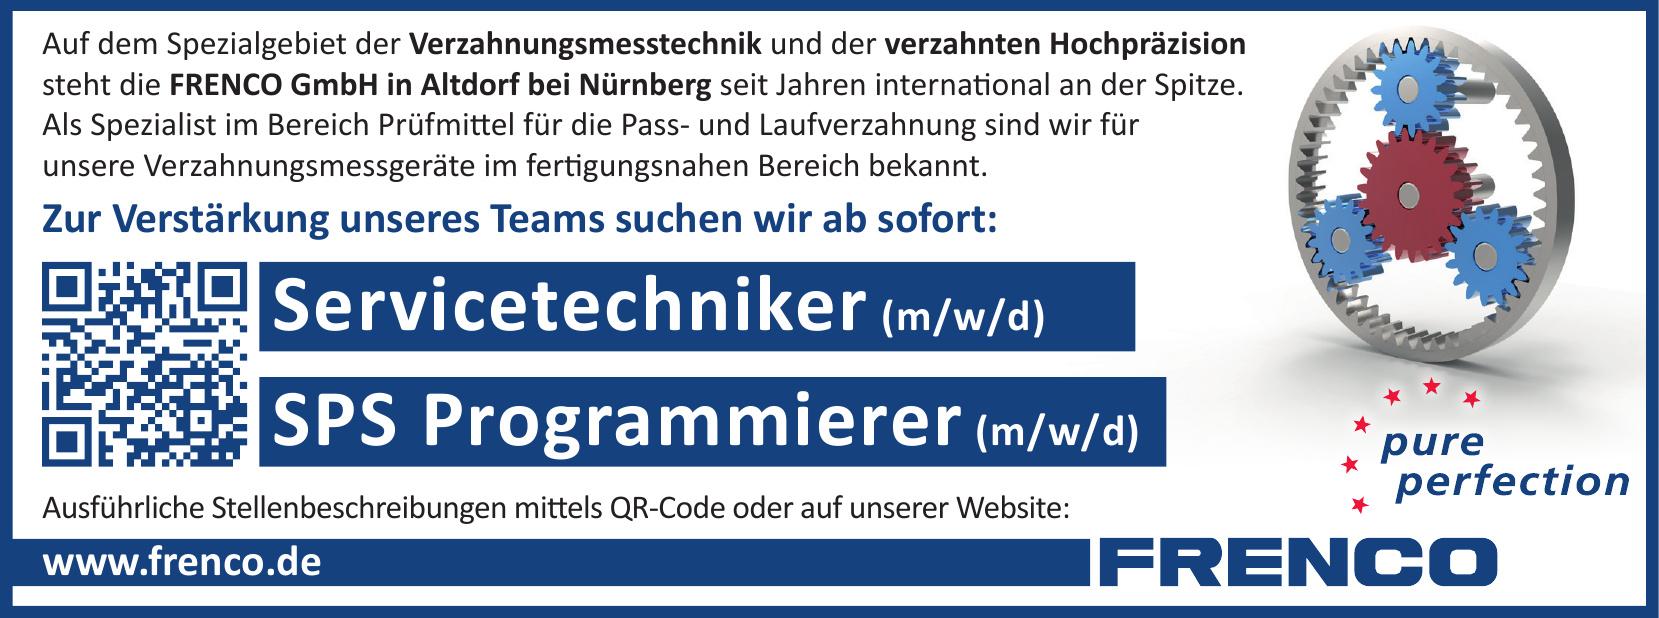 FRENCO GmbH